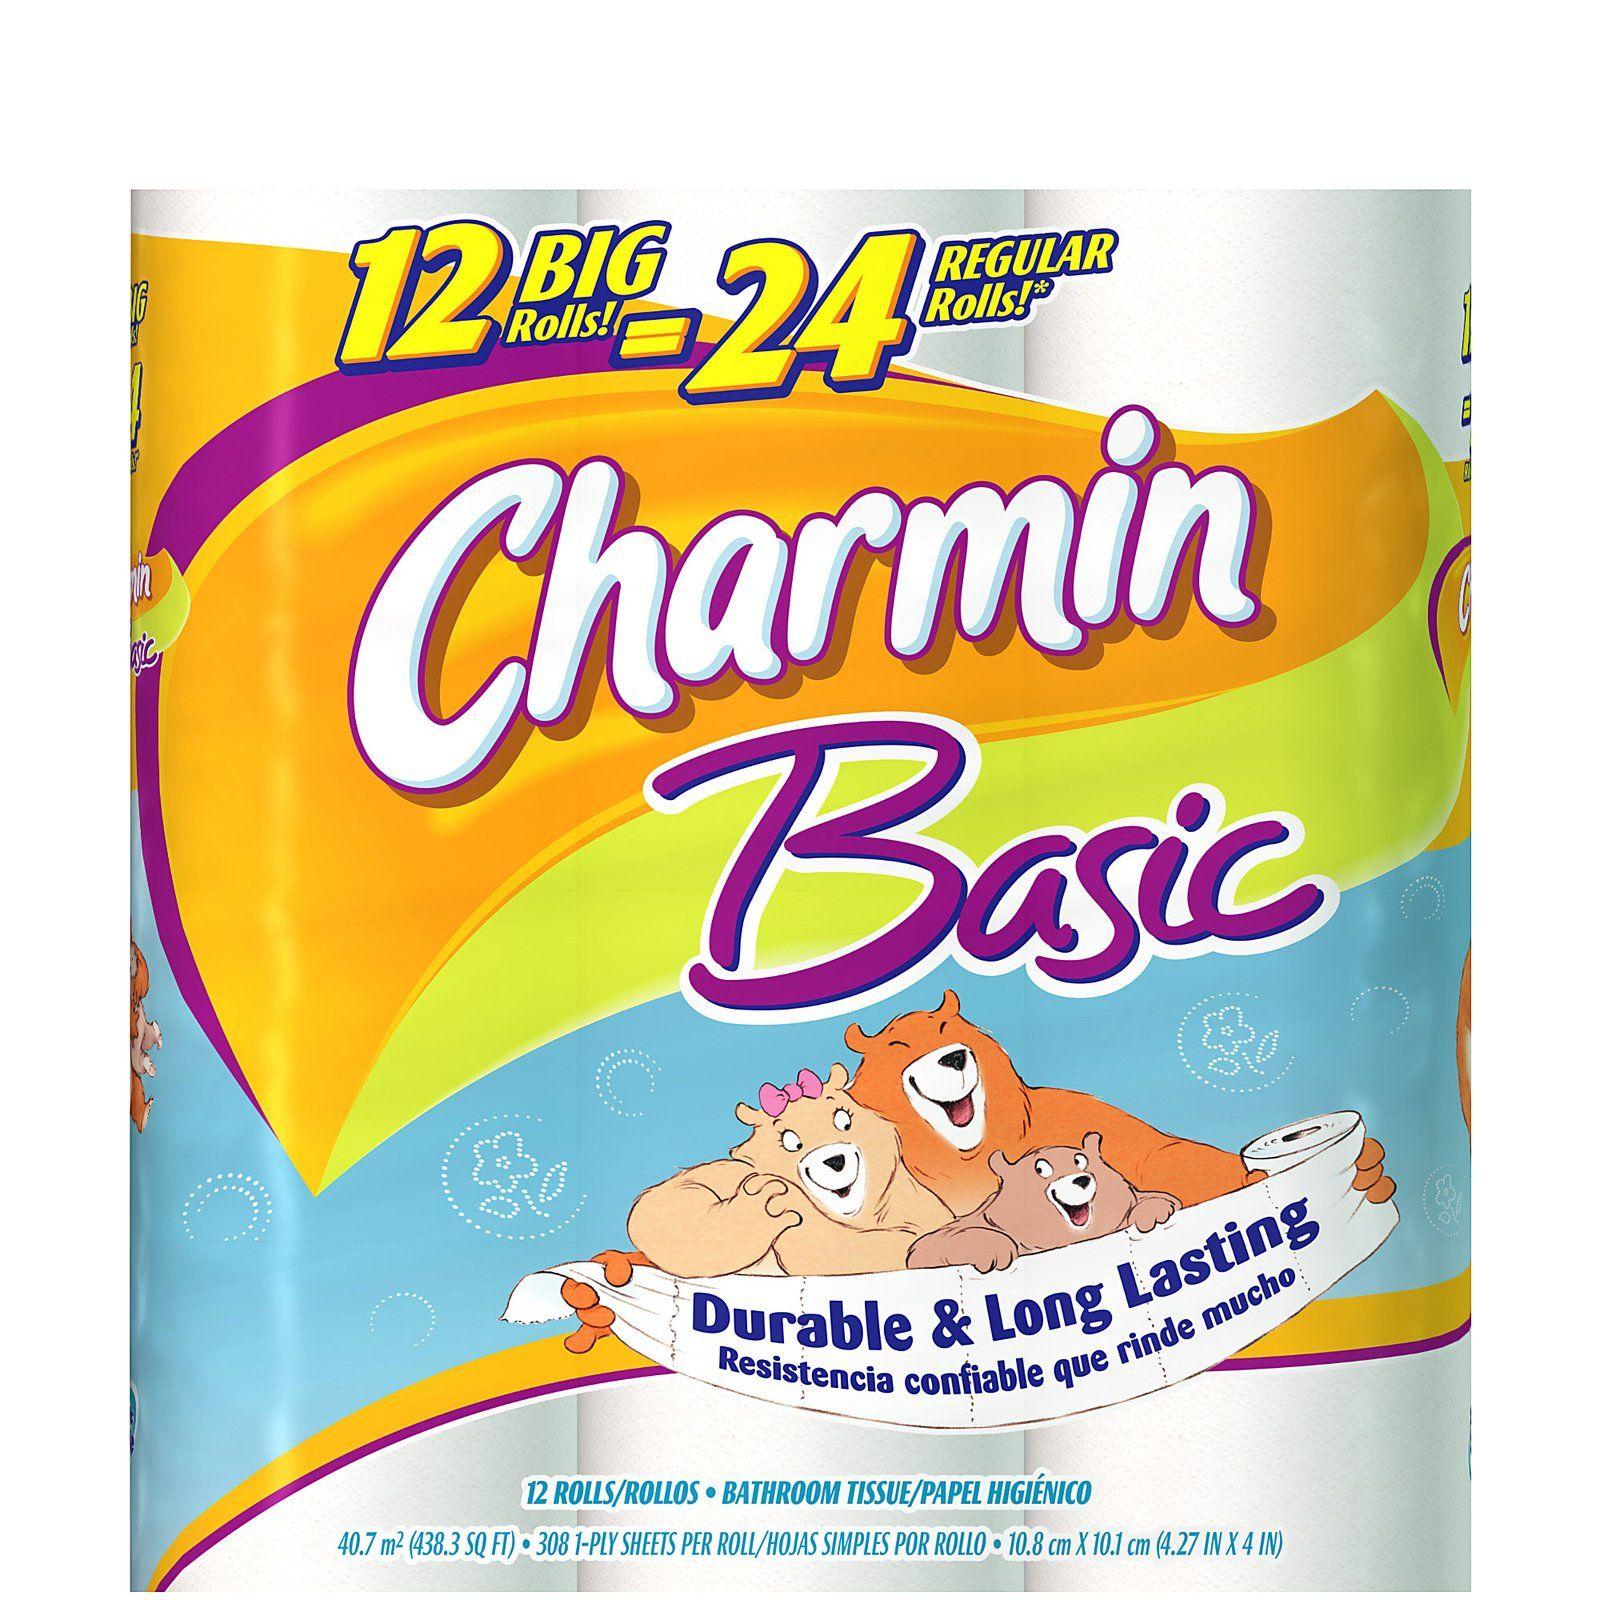 Free Charmin Basic Toilet Paper Mojosavings Com Charmin Basic In Case Of Emergency